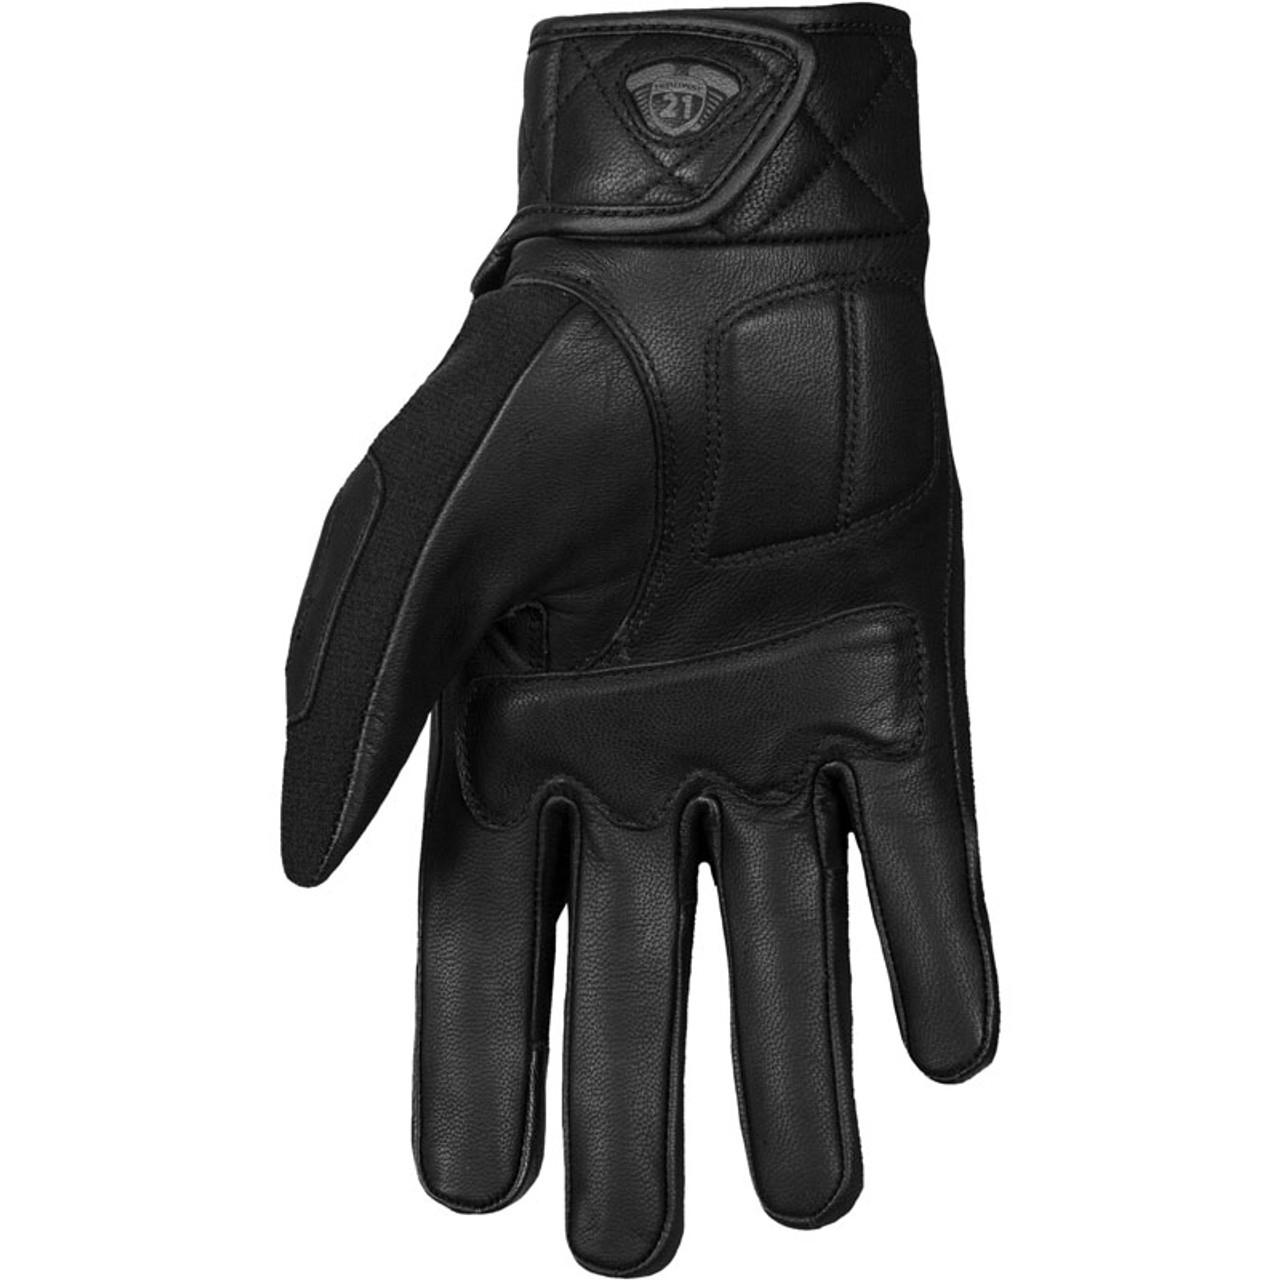 Highway 21 Pitt Letaher Motorcycle Gloves